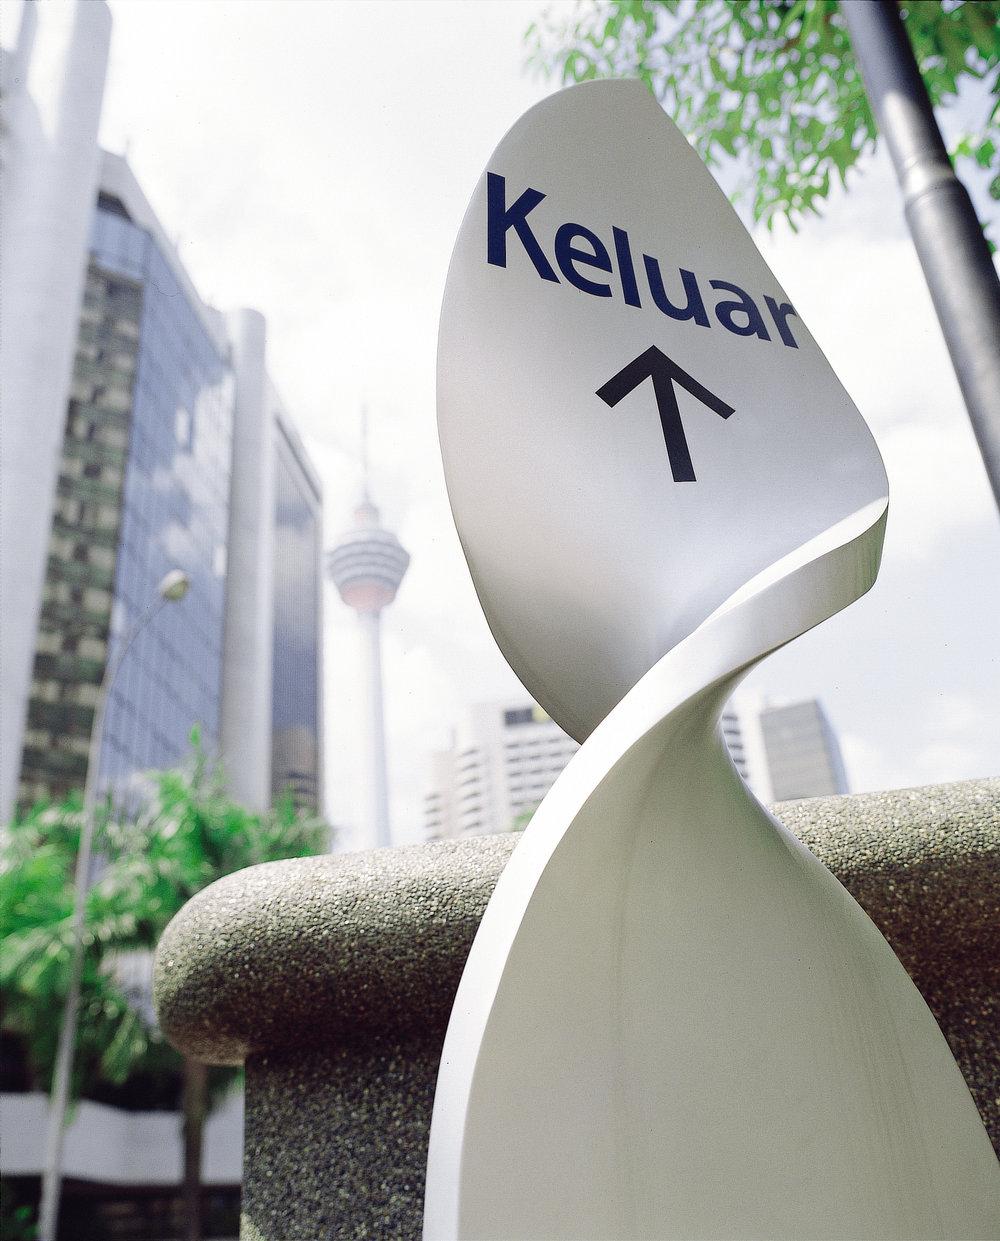 whw_Rohas_Keluar Sign.jpg